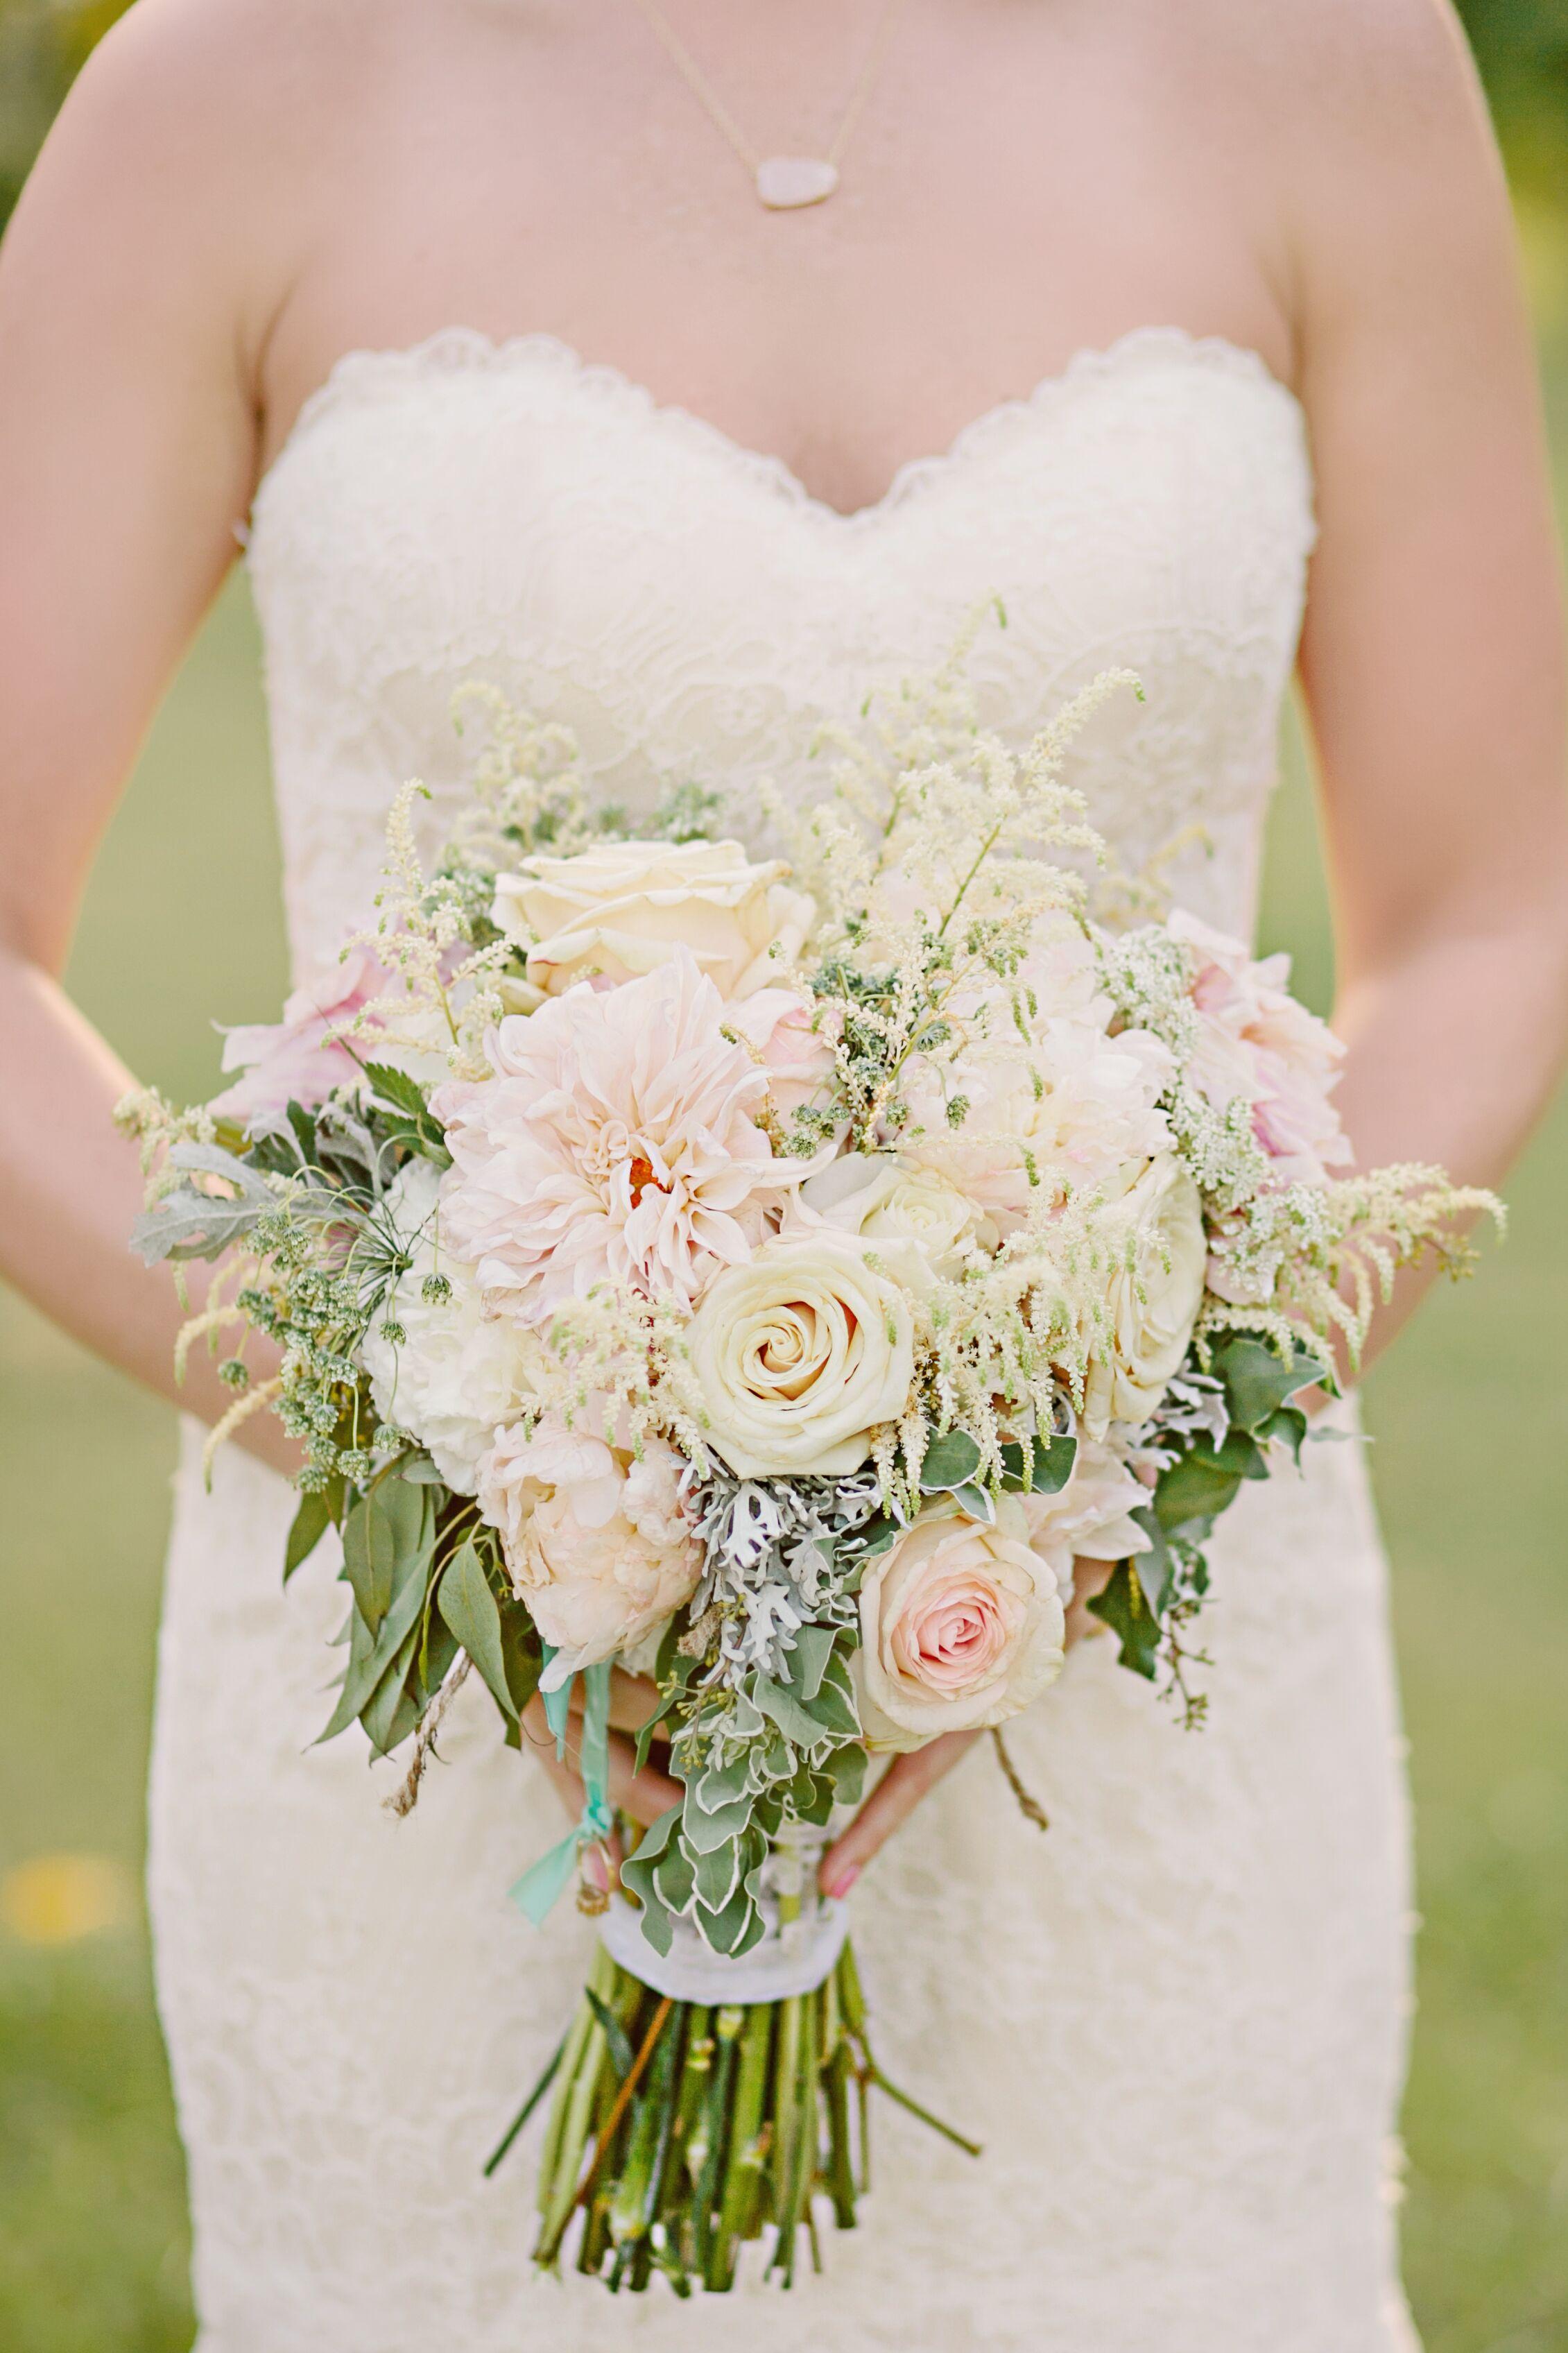 Romantic Hotel Room Ideas: Blush And Ivory Romantic Bridal Bouquet